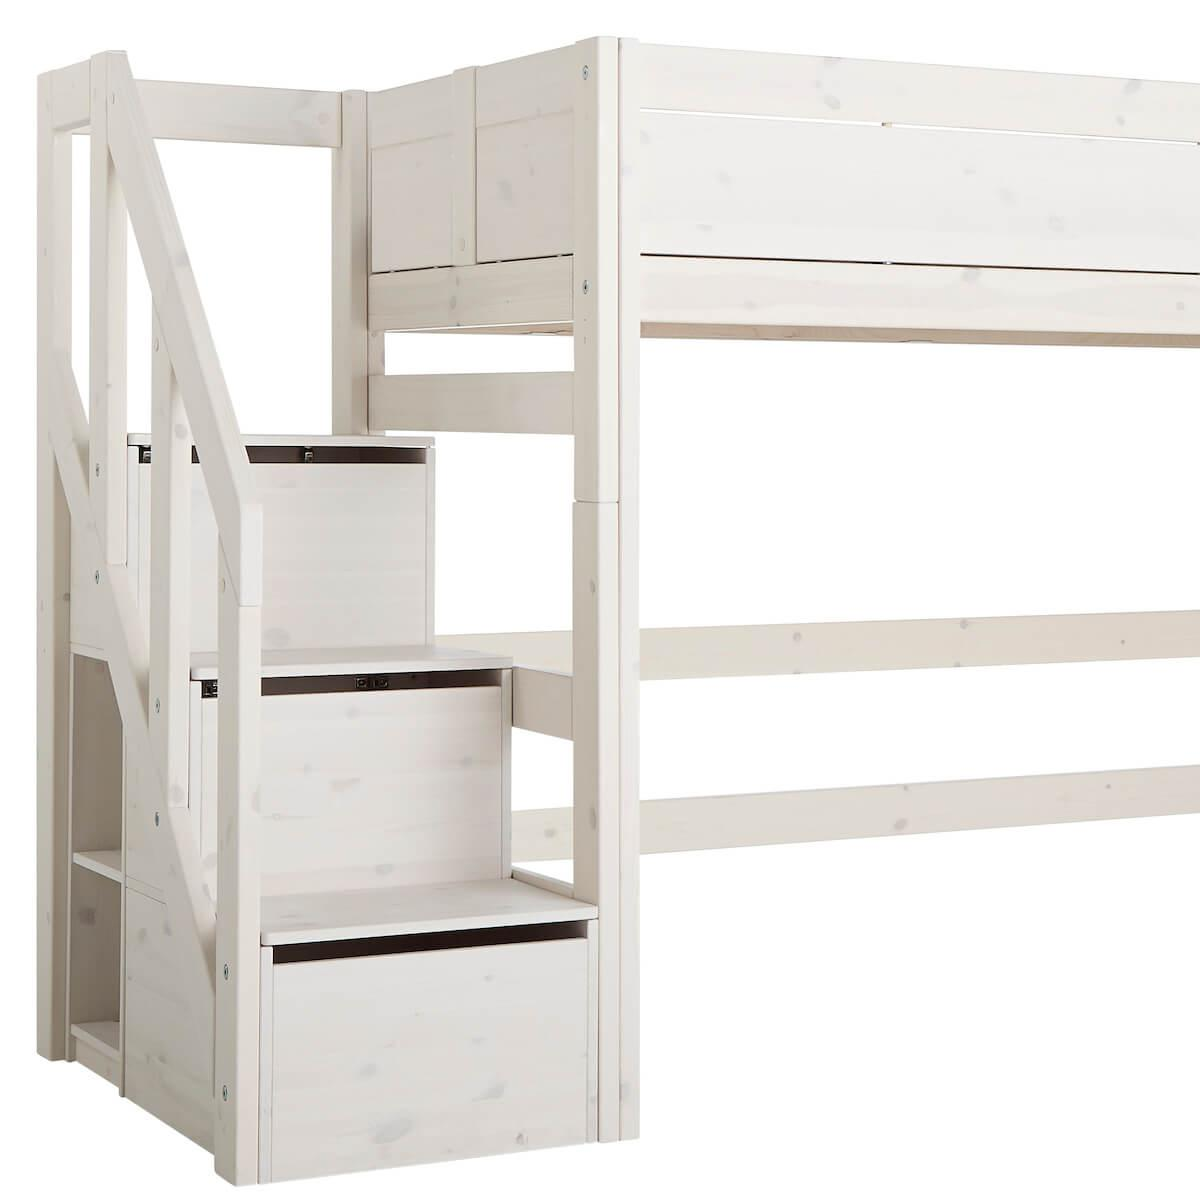 Halbhohes Bett 90x200cm escalier Lifetime white wash